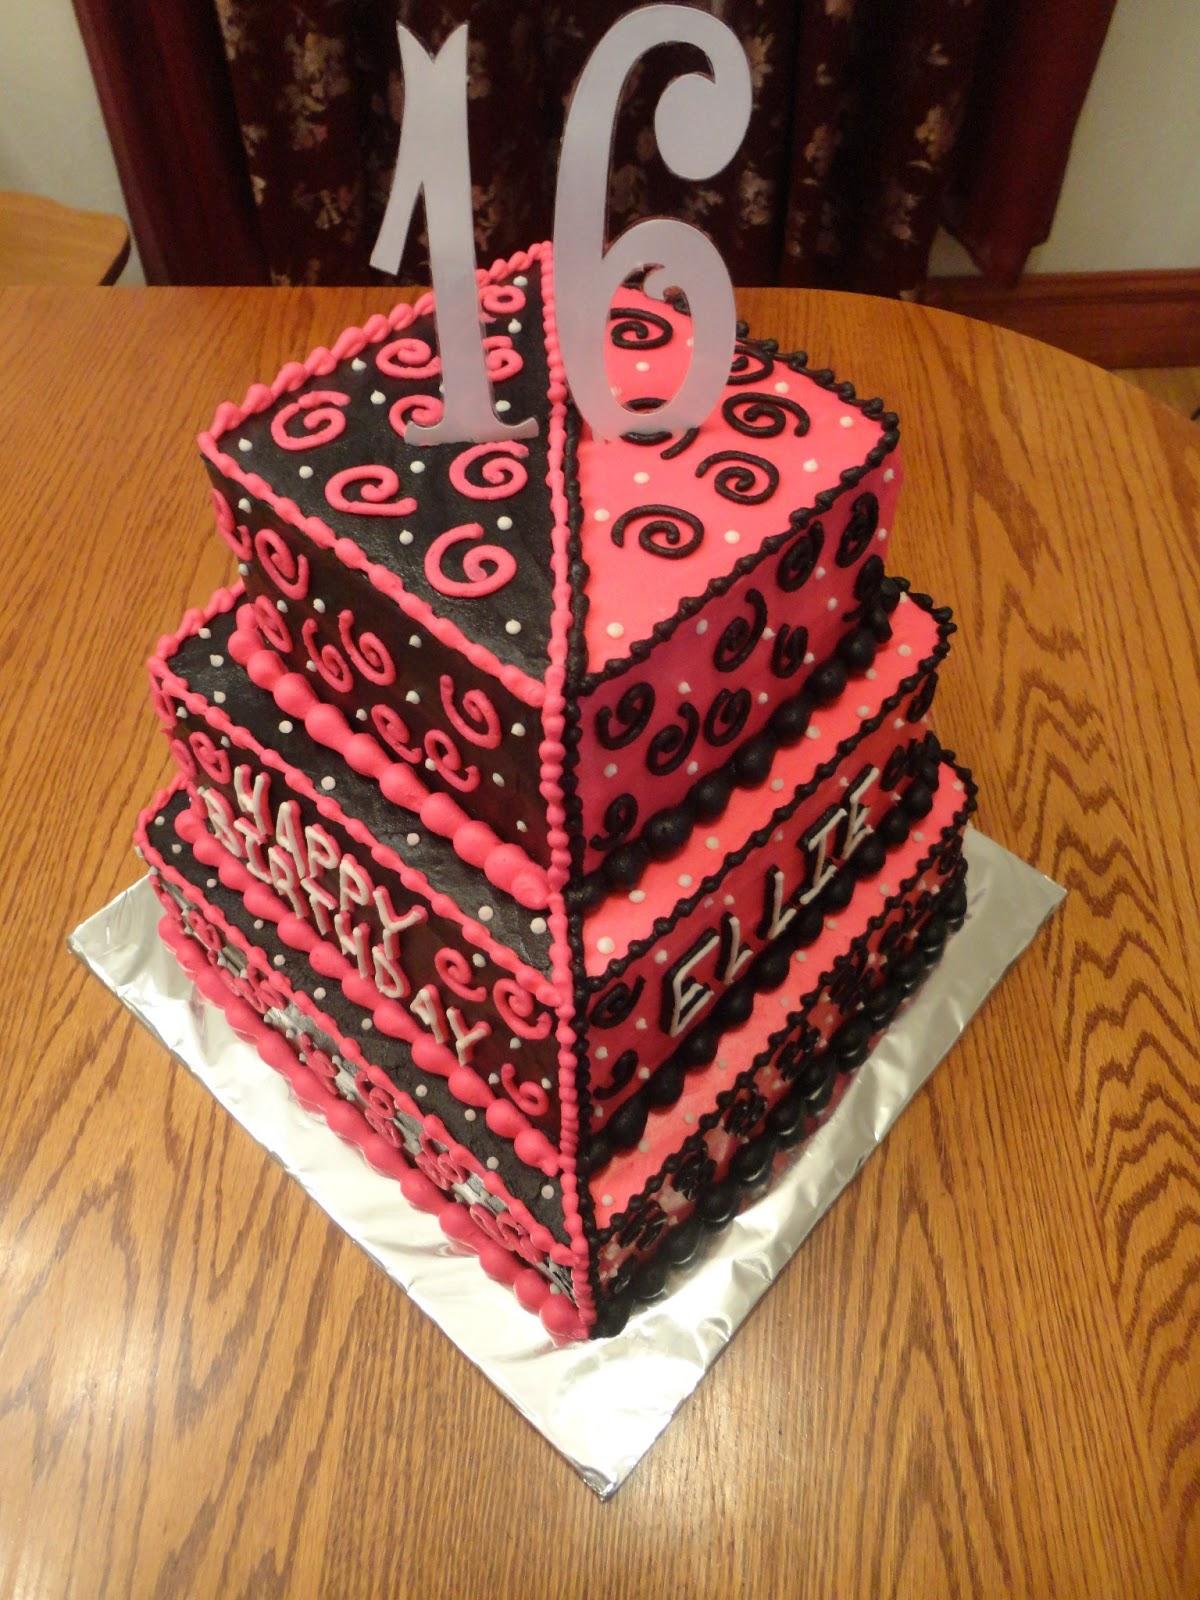 16 Year Old Birthday Cake Girl